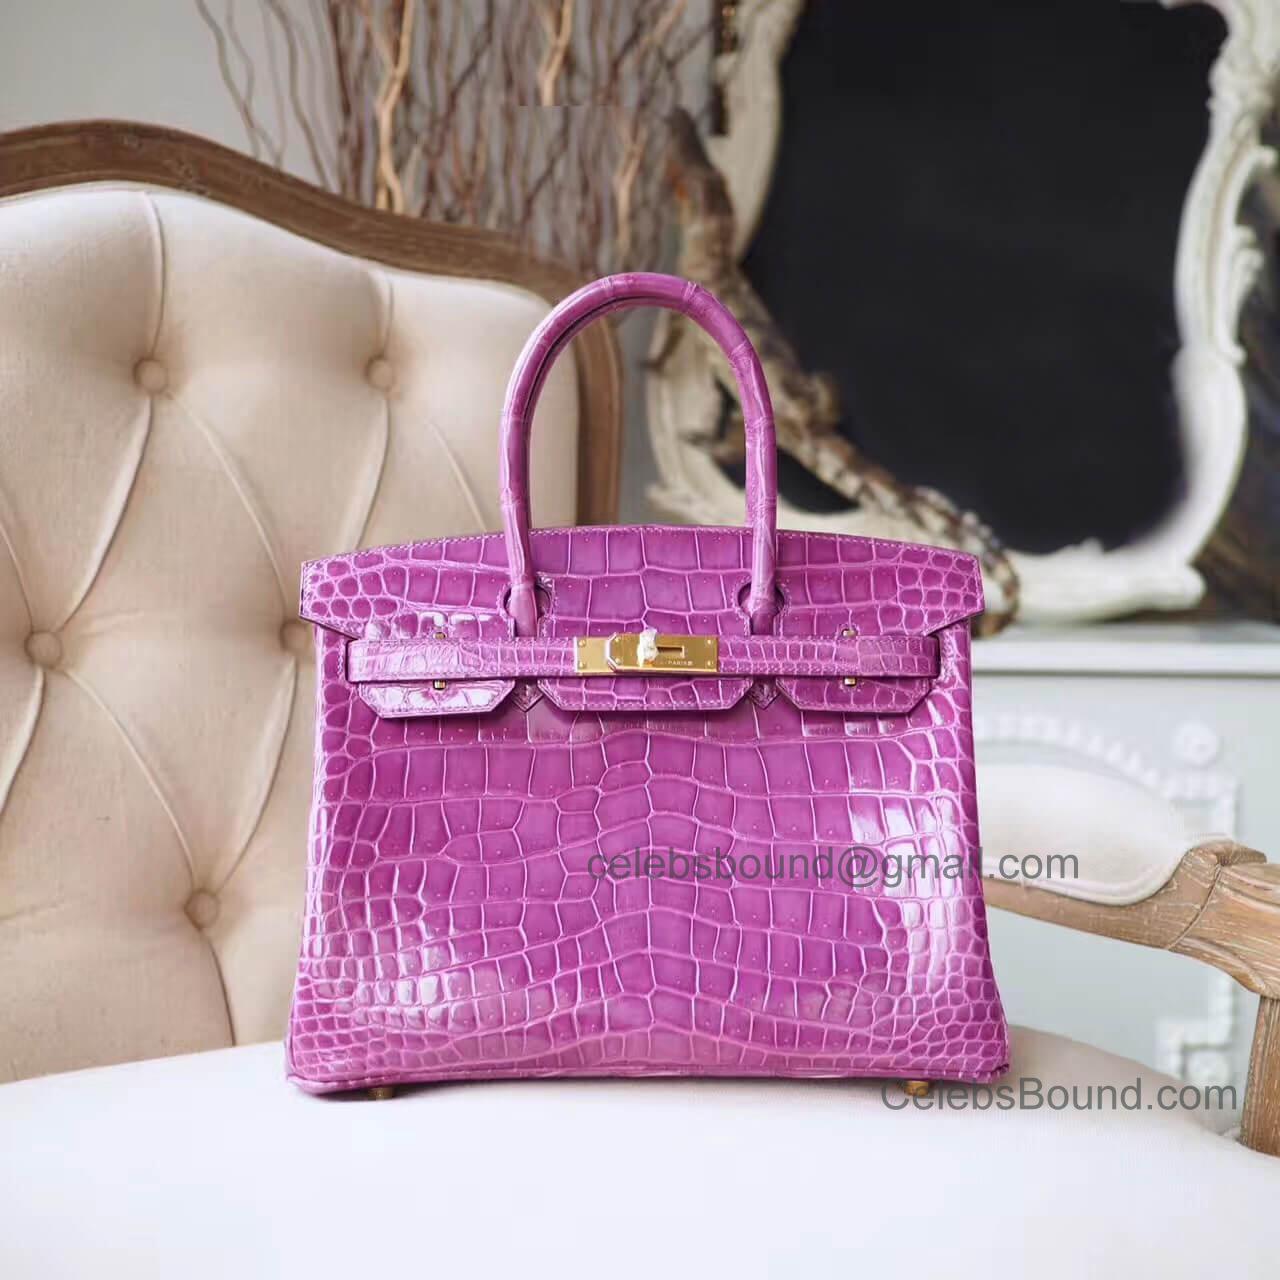 93fcf6edf9cc Copy Hermes Birkin 30 Bag in 5c Violet Shiny Porosus Croc GHW